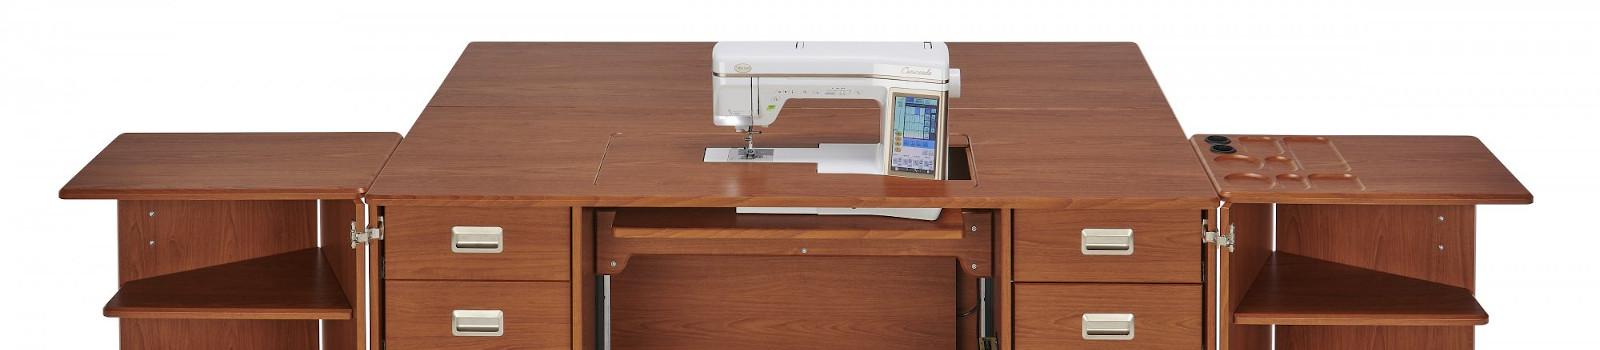 Koala Artisan DesignPro Sewing Cabinet